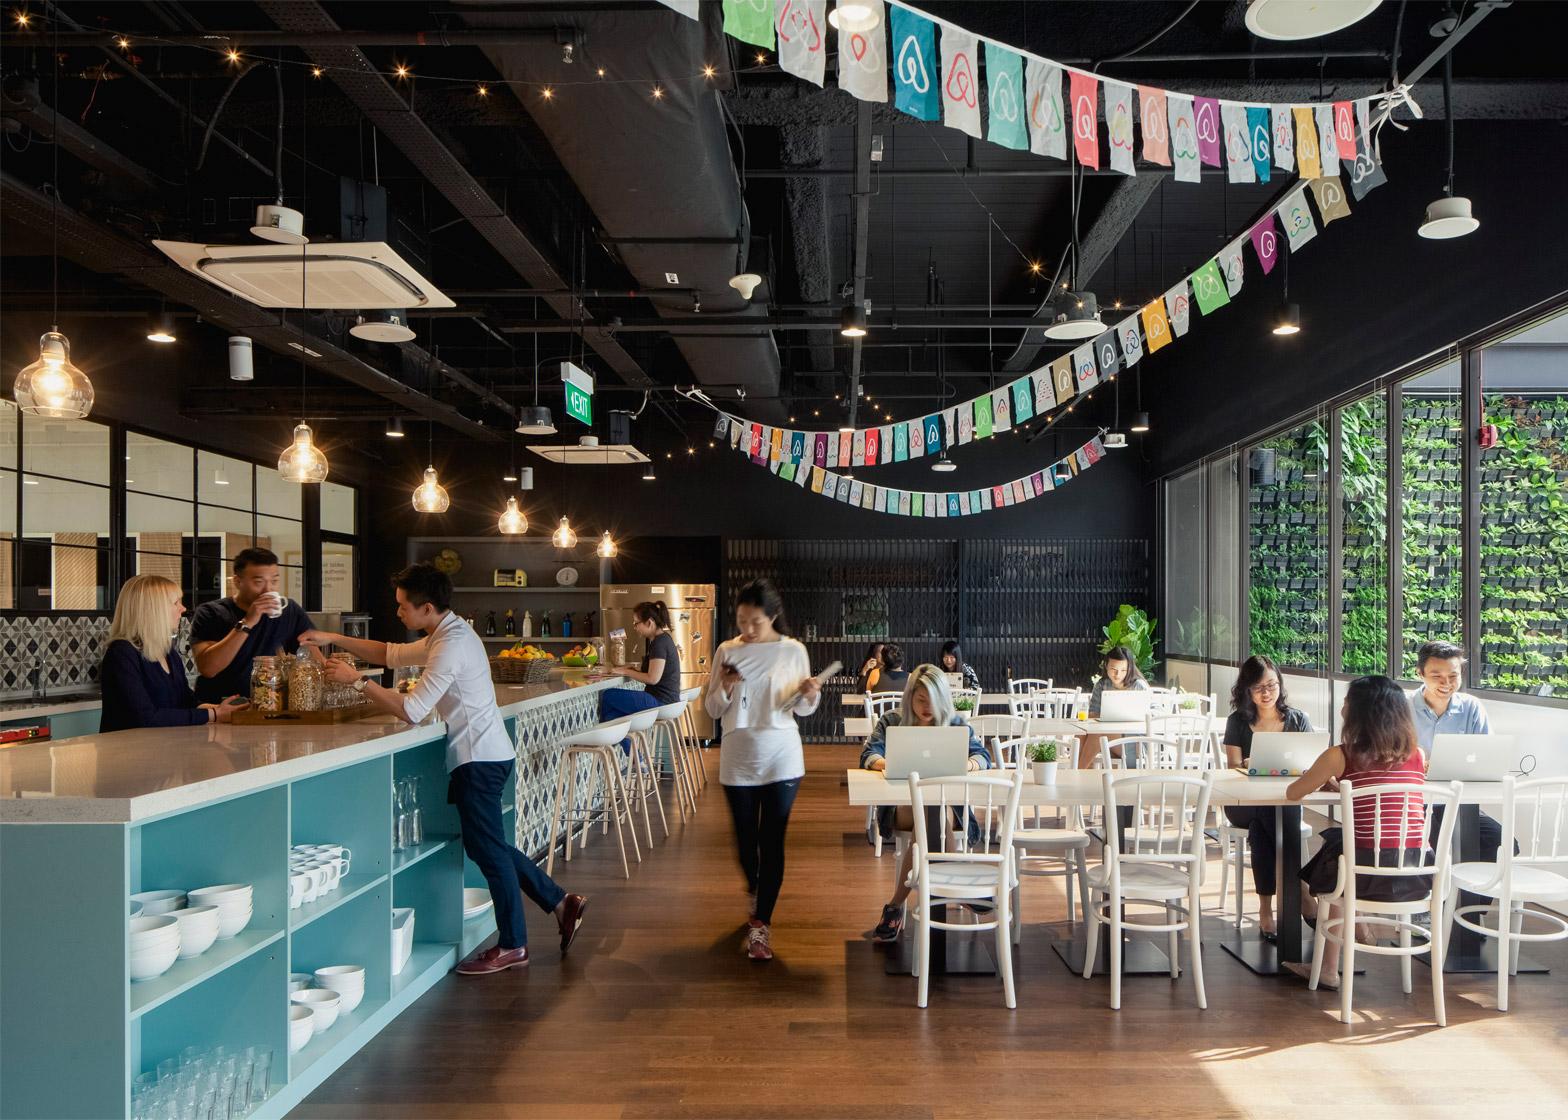 airbnb-offices-singapore-farm_dezeen_1568_6